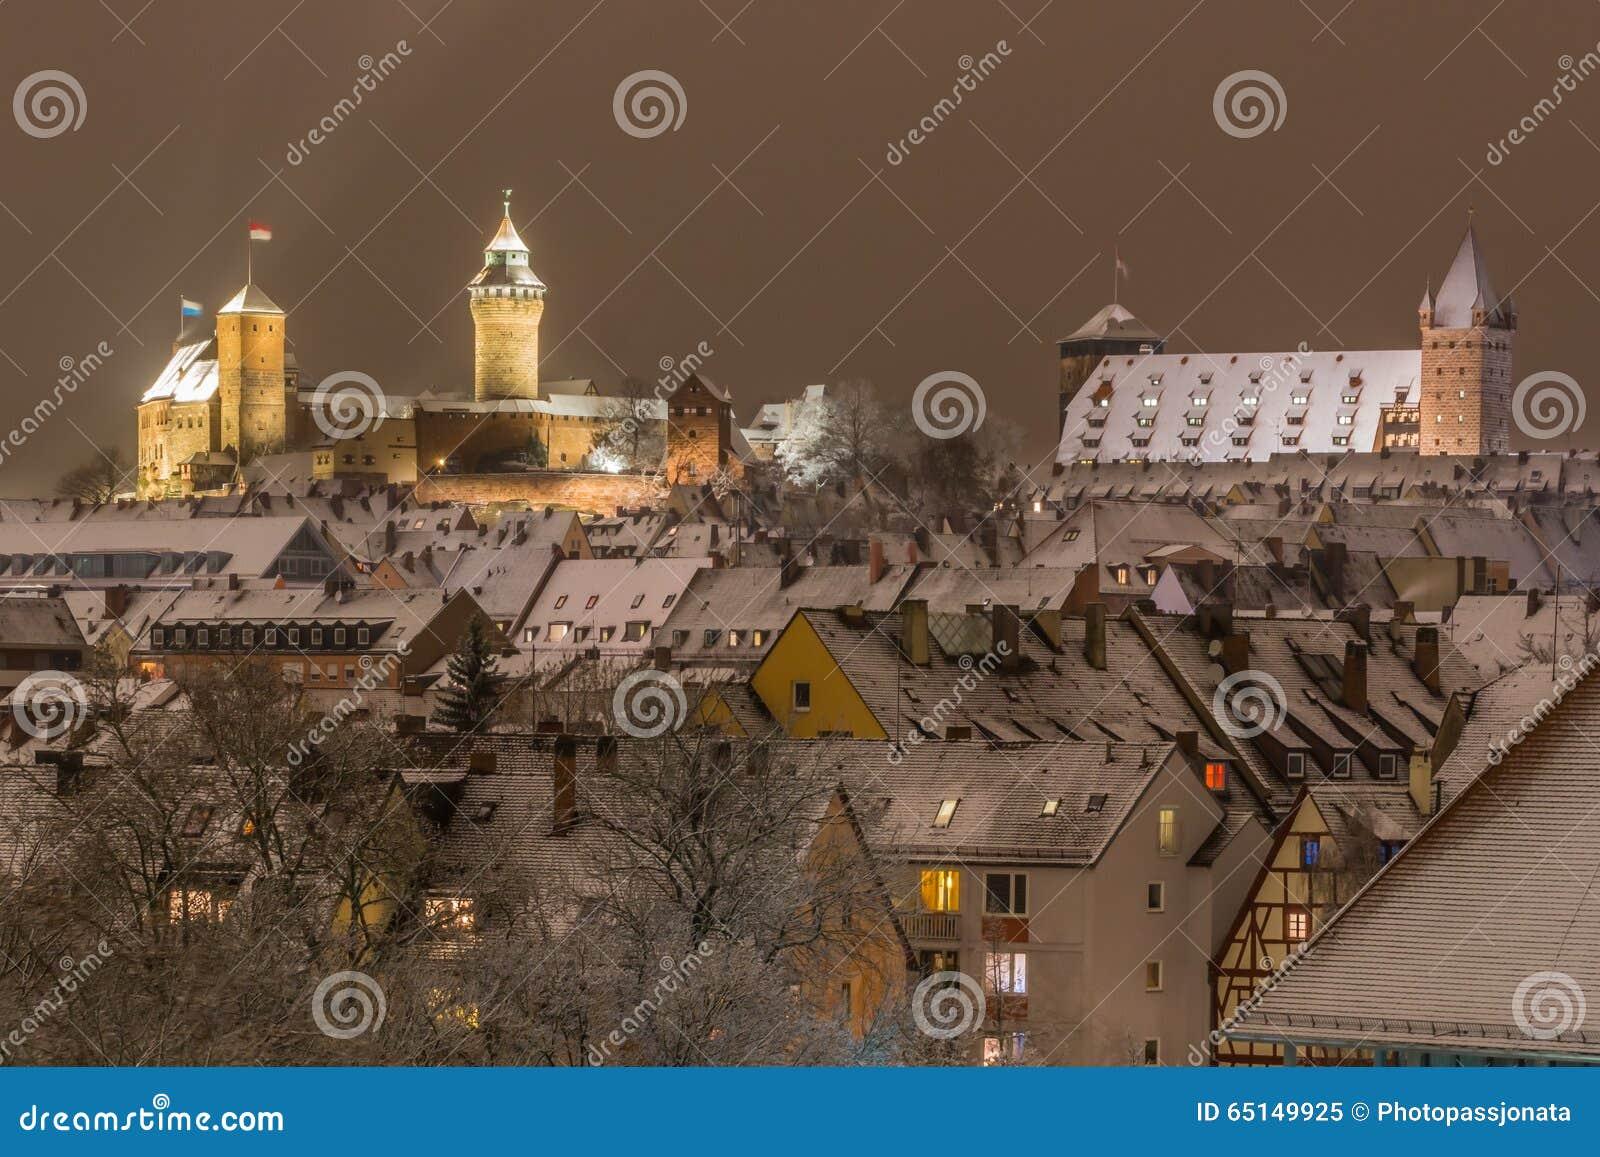 Snowy city by night-Nuremberg-Germany